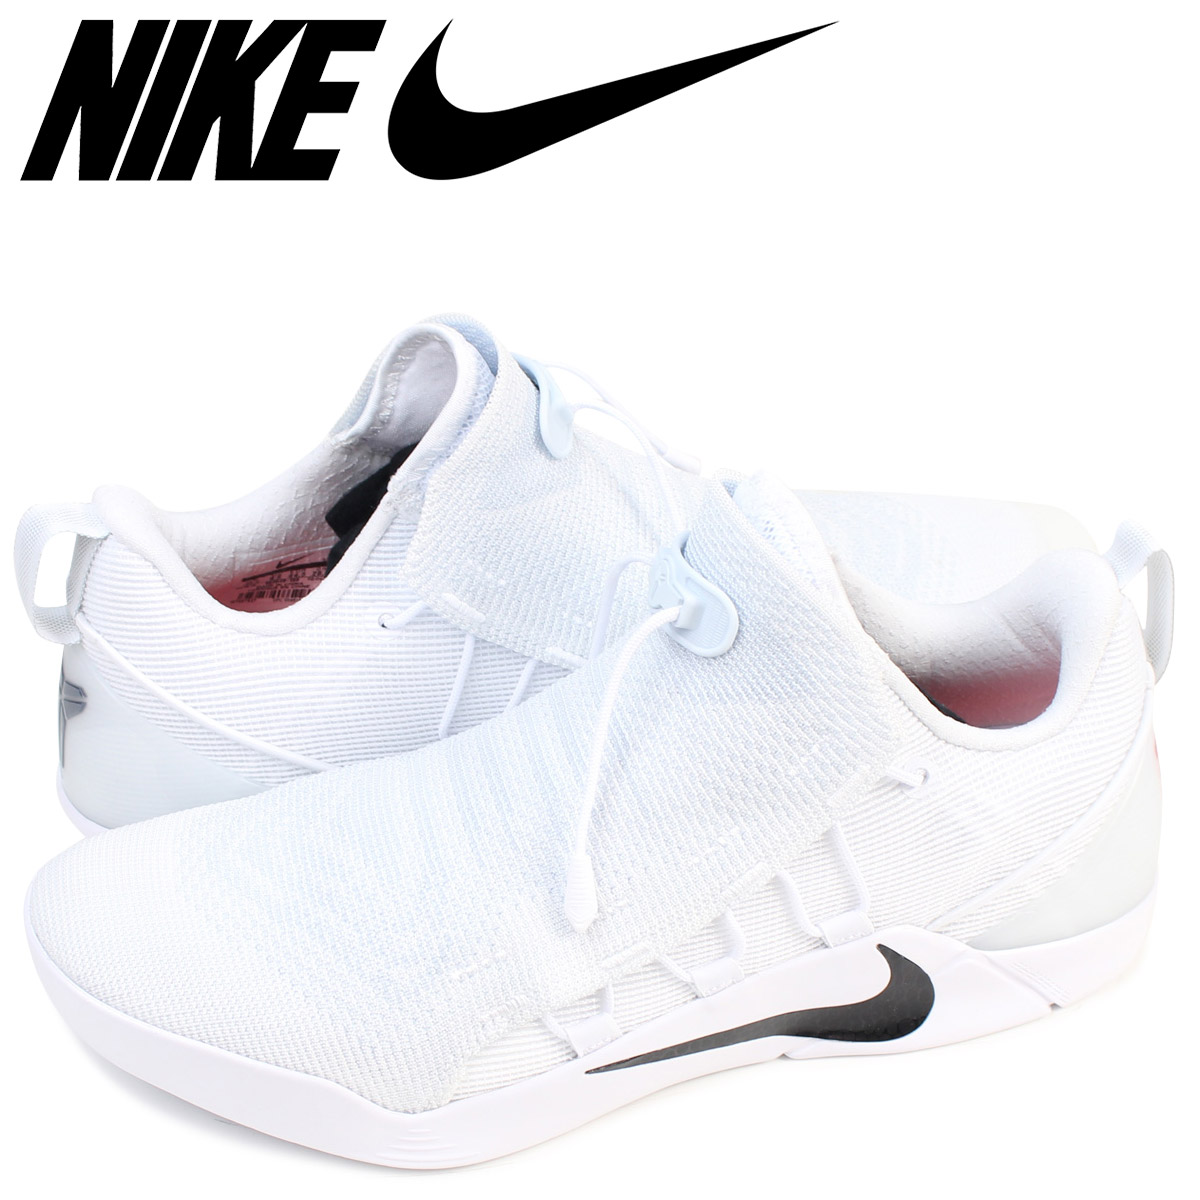 Nike Kobe A.D.NXT White Black 882049_100 Chaussures Nike